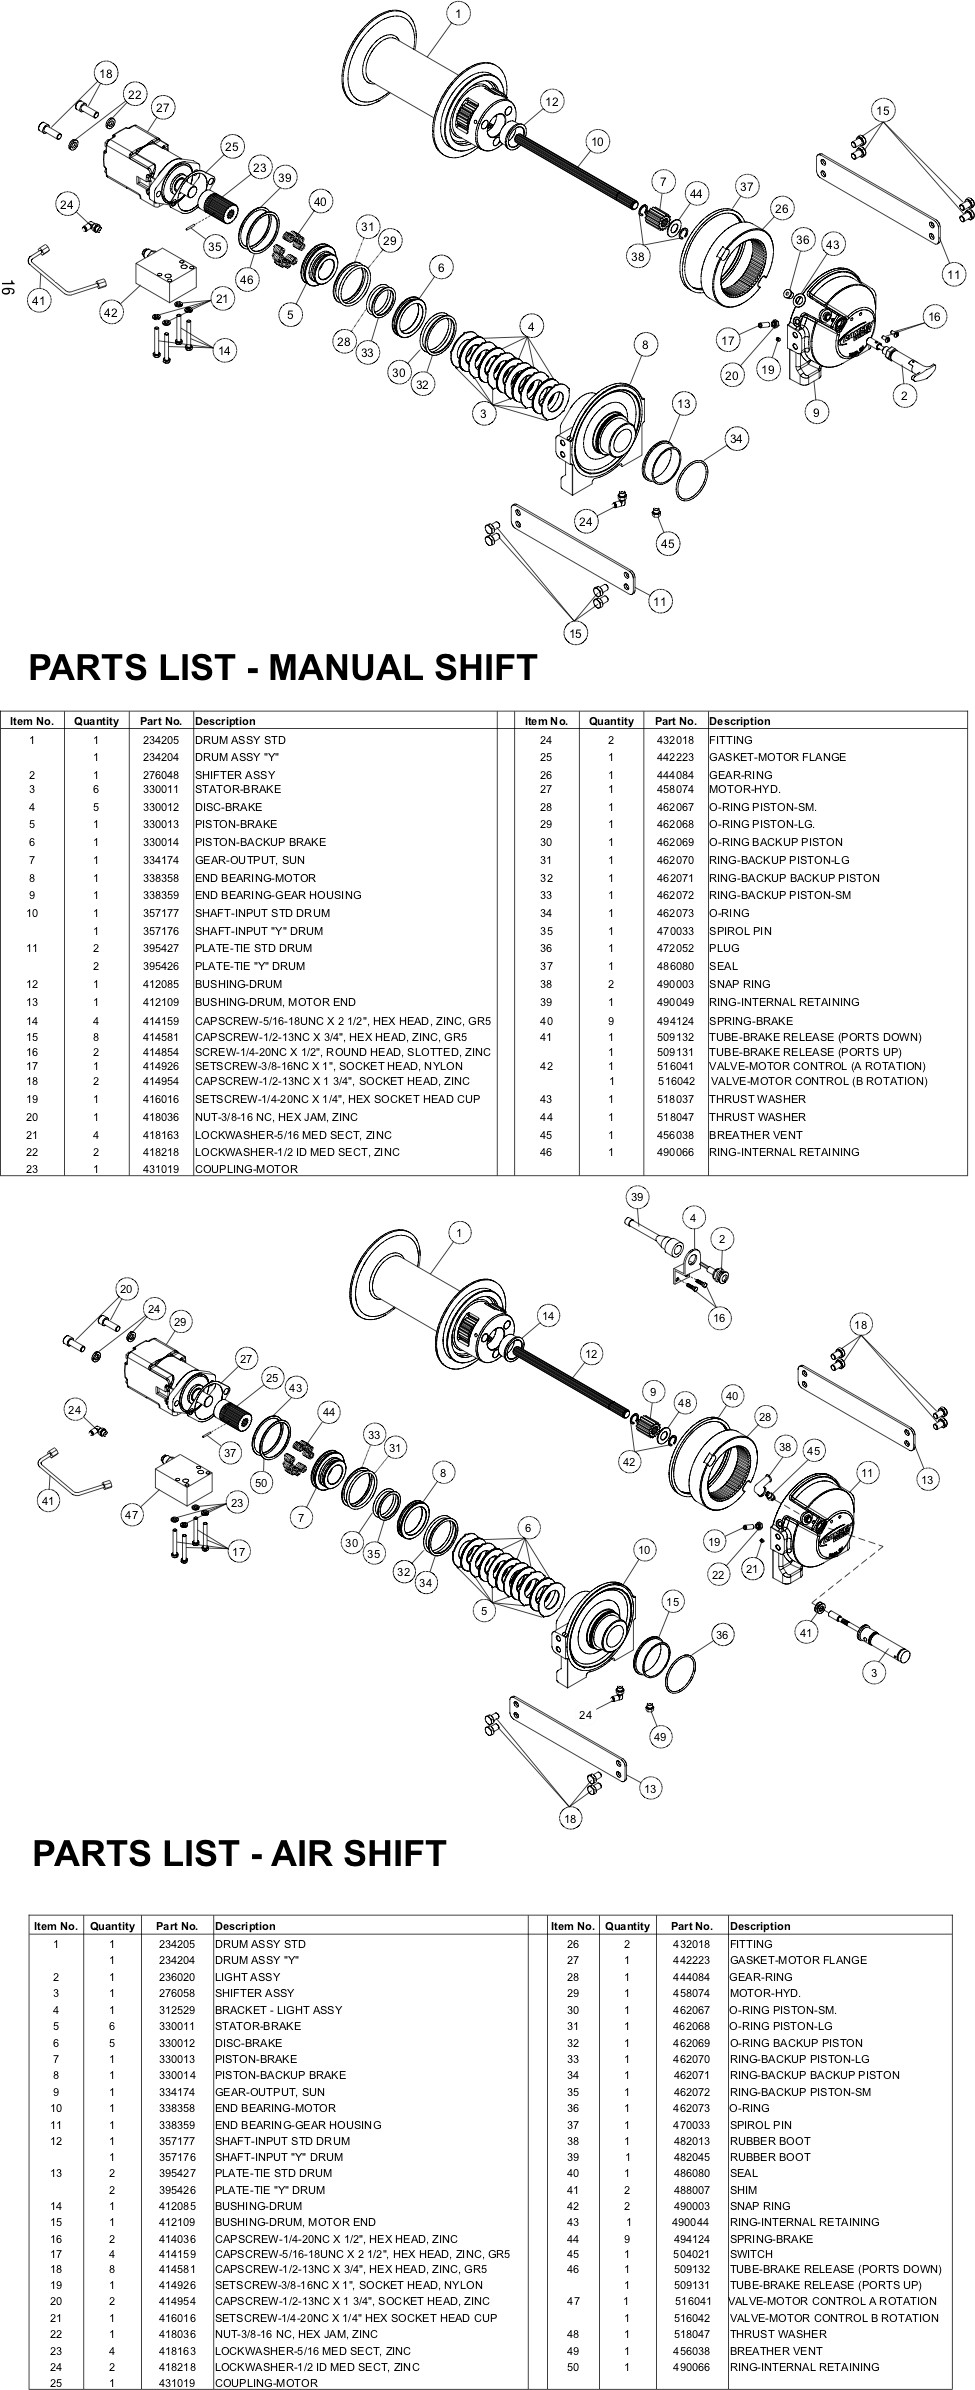 Ramsey Winch HDP 8,000 Parts